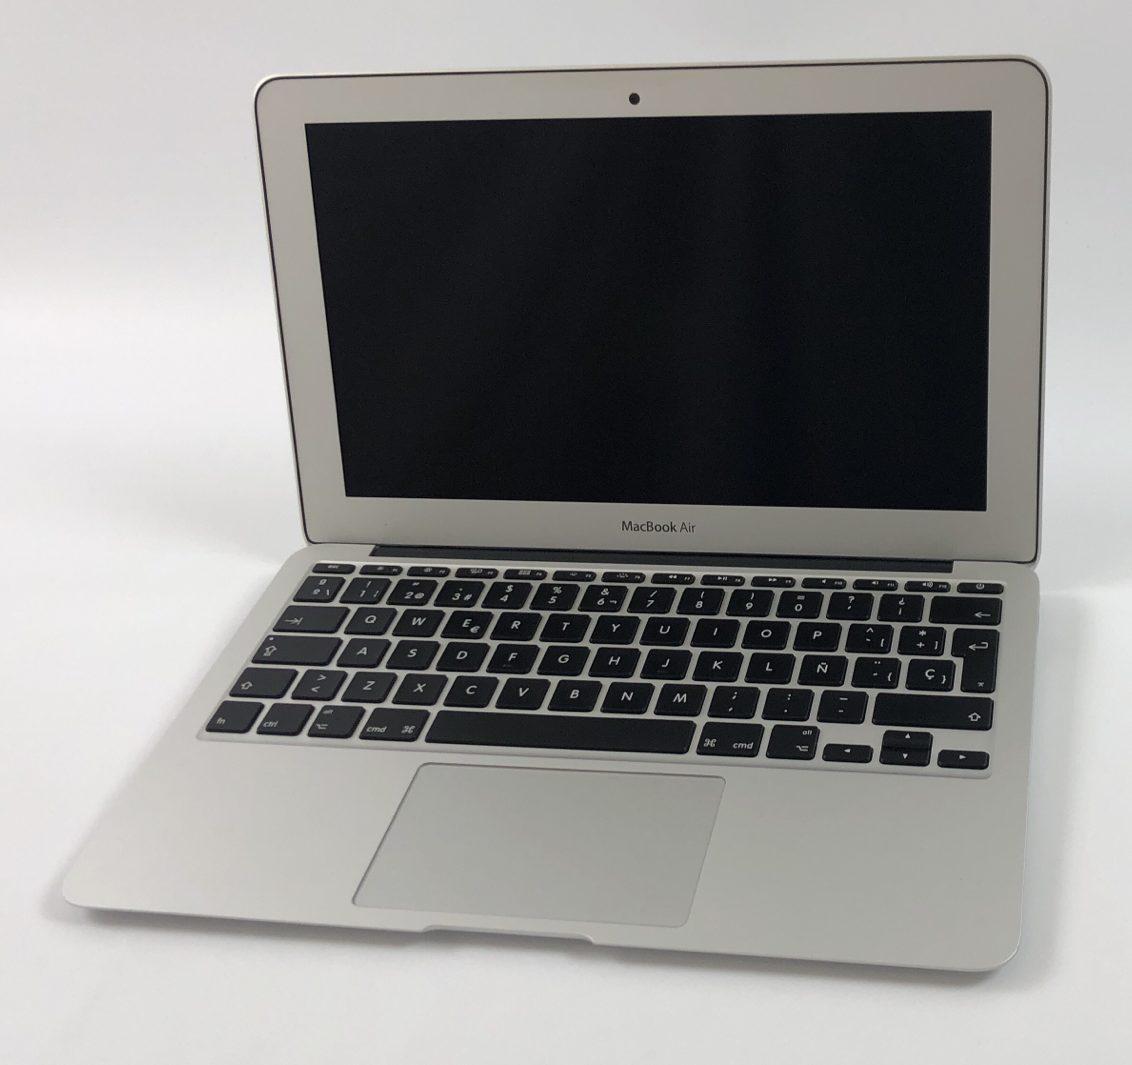 "MacBook Air 11"" Early 2015 (Intel Core i5 1.6 GHz 4 GB RAM 128 GB SSD), Intel Core i5 1.6 GHz, 4 GB RAM, 128 GB SSD, imagen 1"